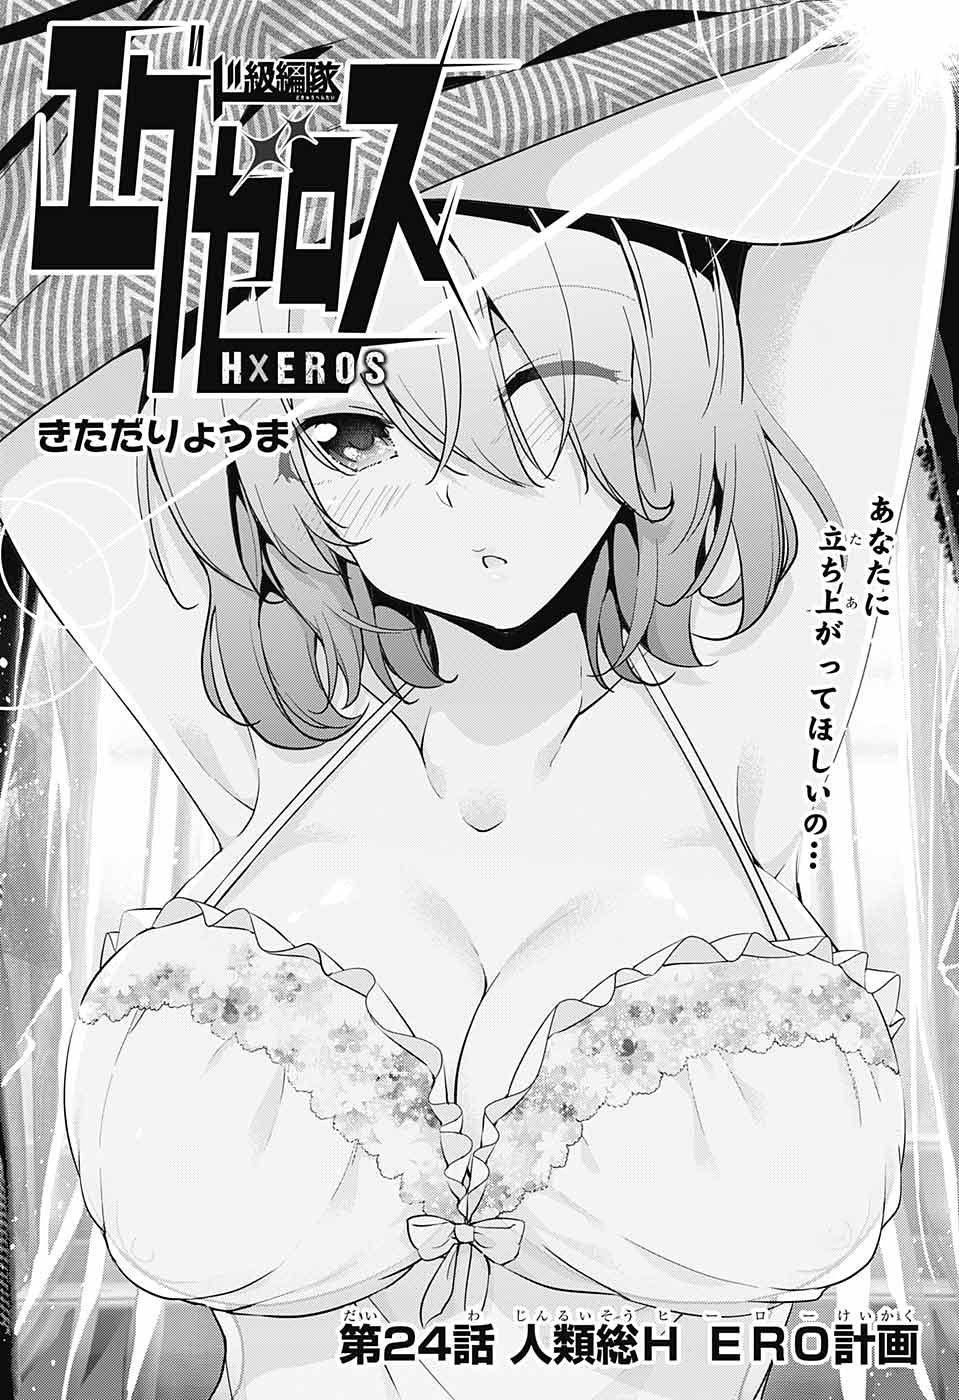 Dokyuu-Hentai-HxEros Chapter 024 Page 1